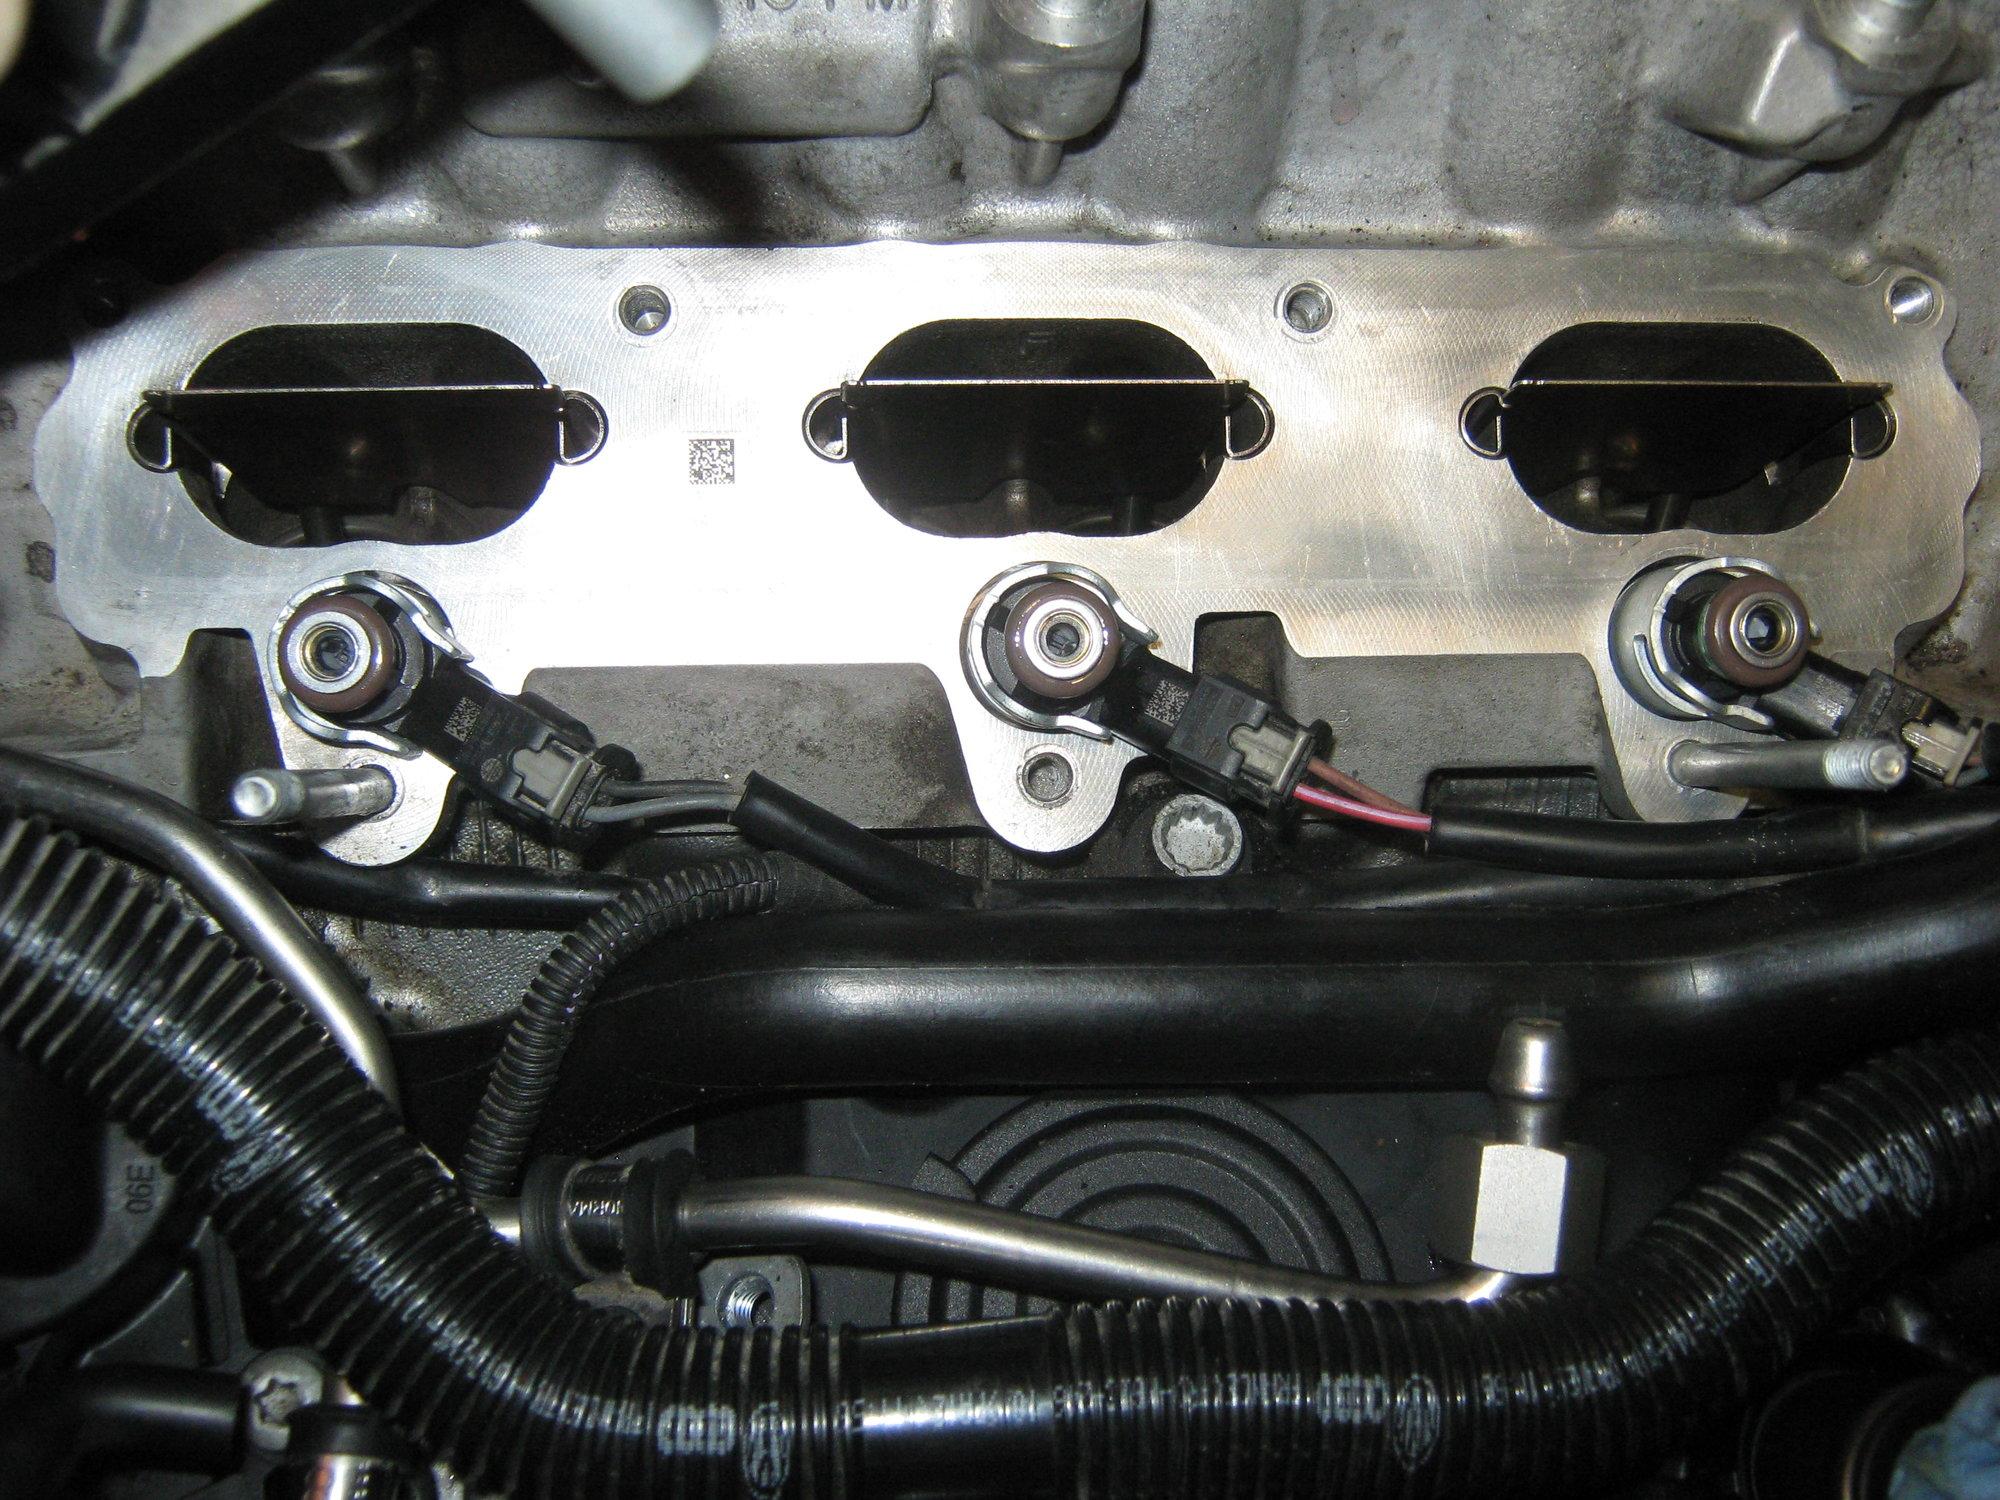 fault code  Check engine light